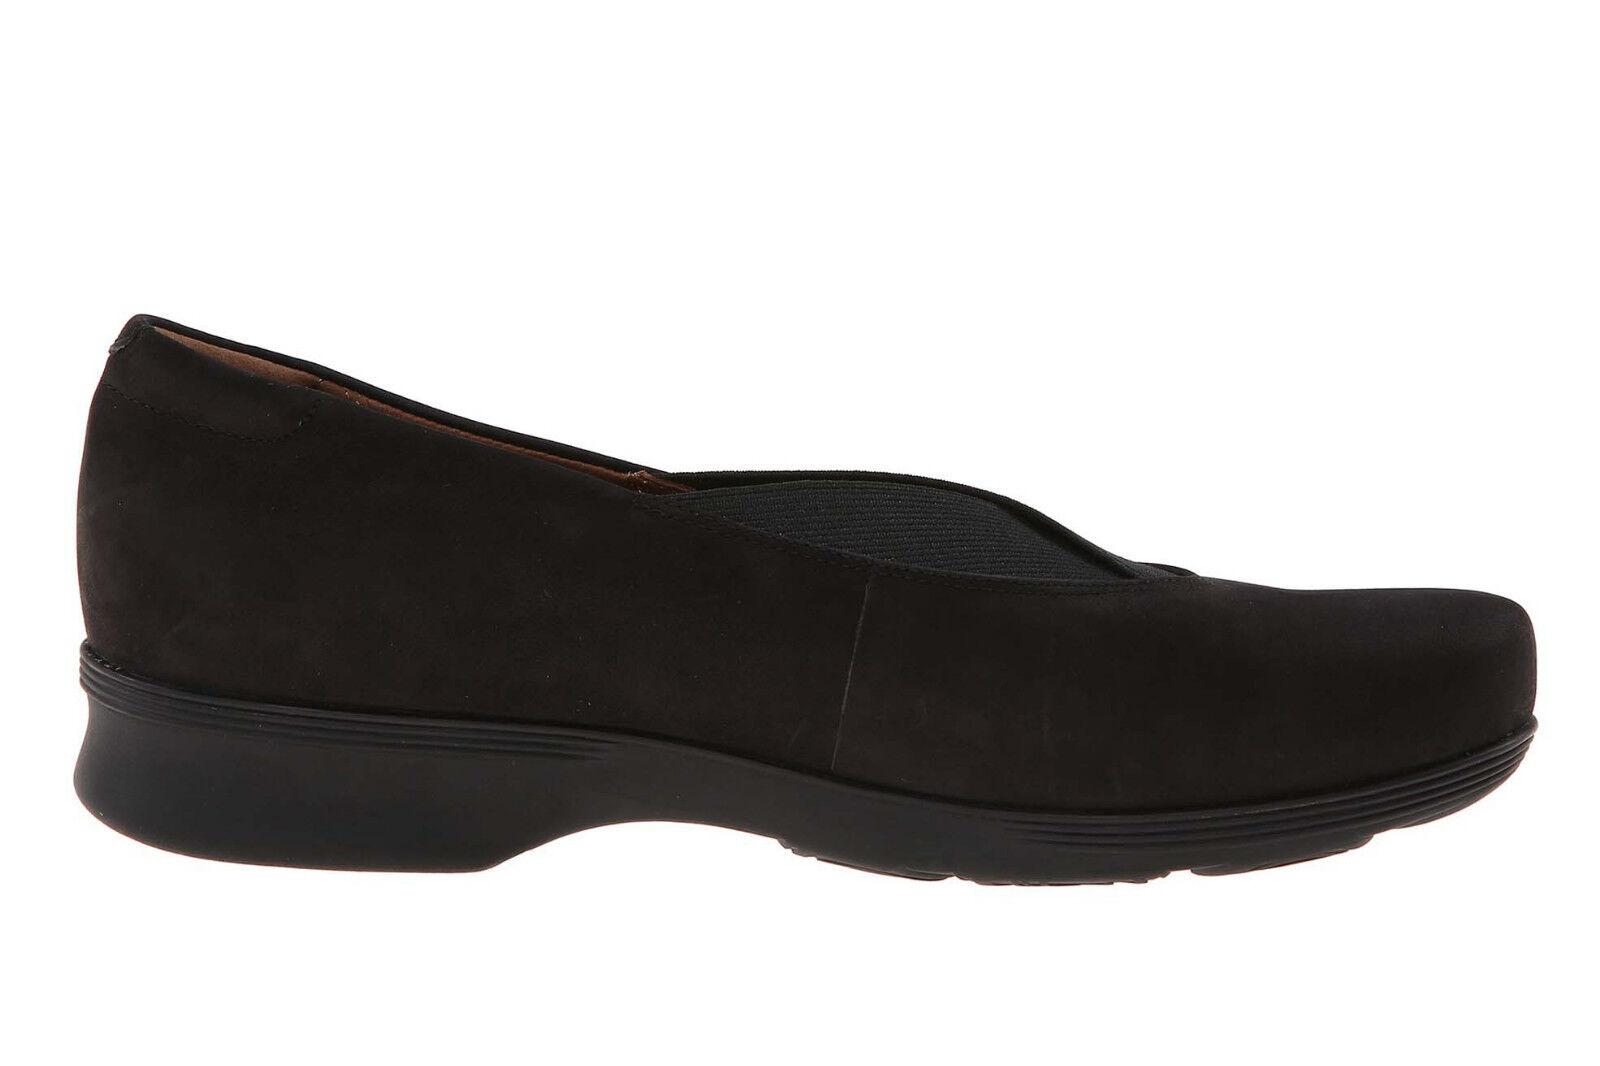 New Clarks AURBIA FAY Nubuck Women Shoes Sz 8 (MSRP $130)